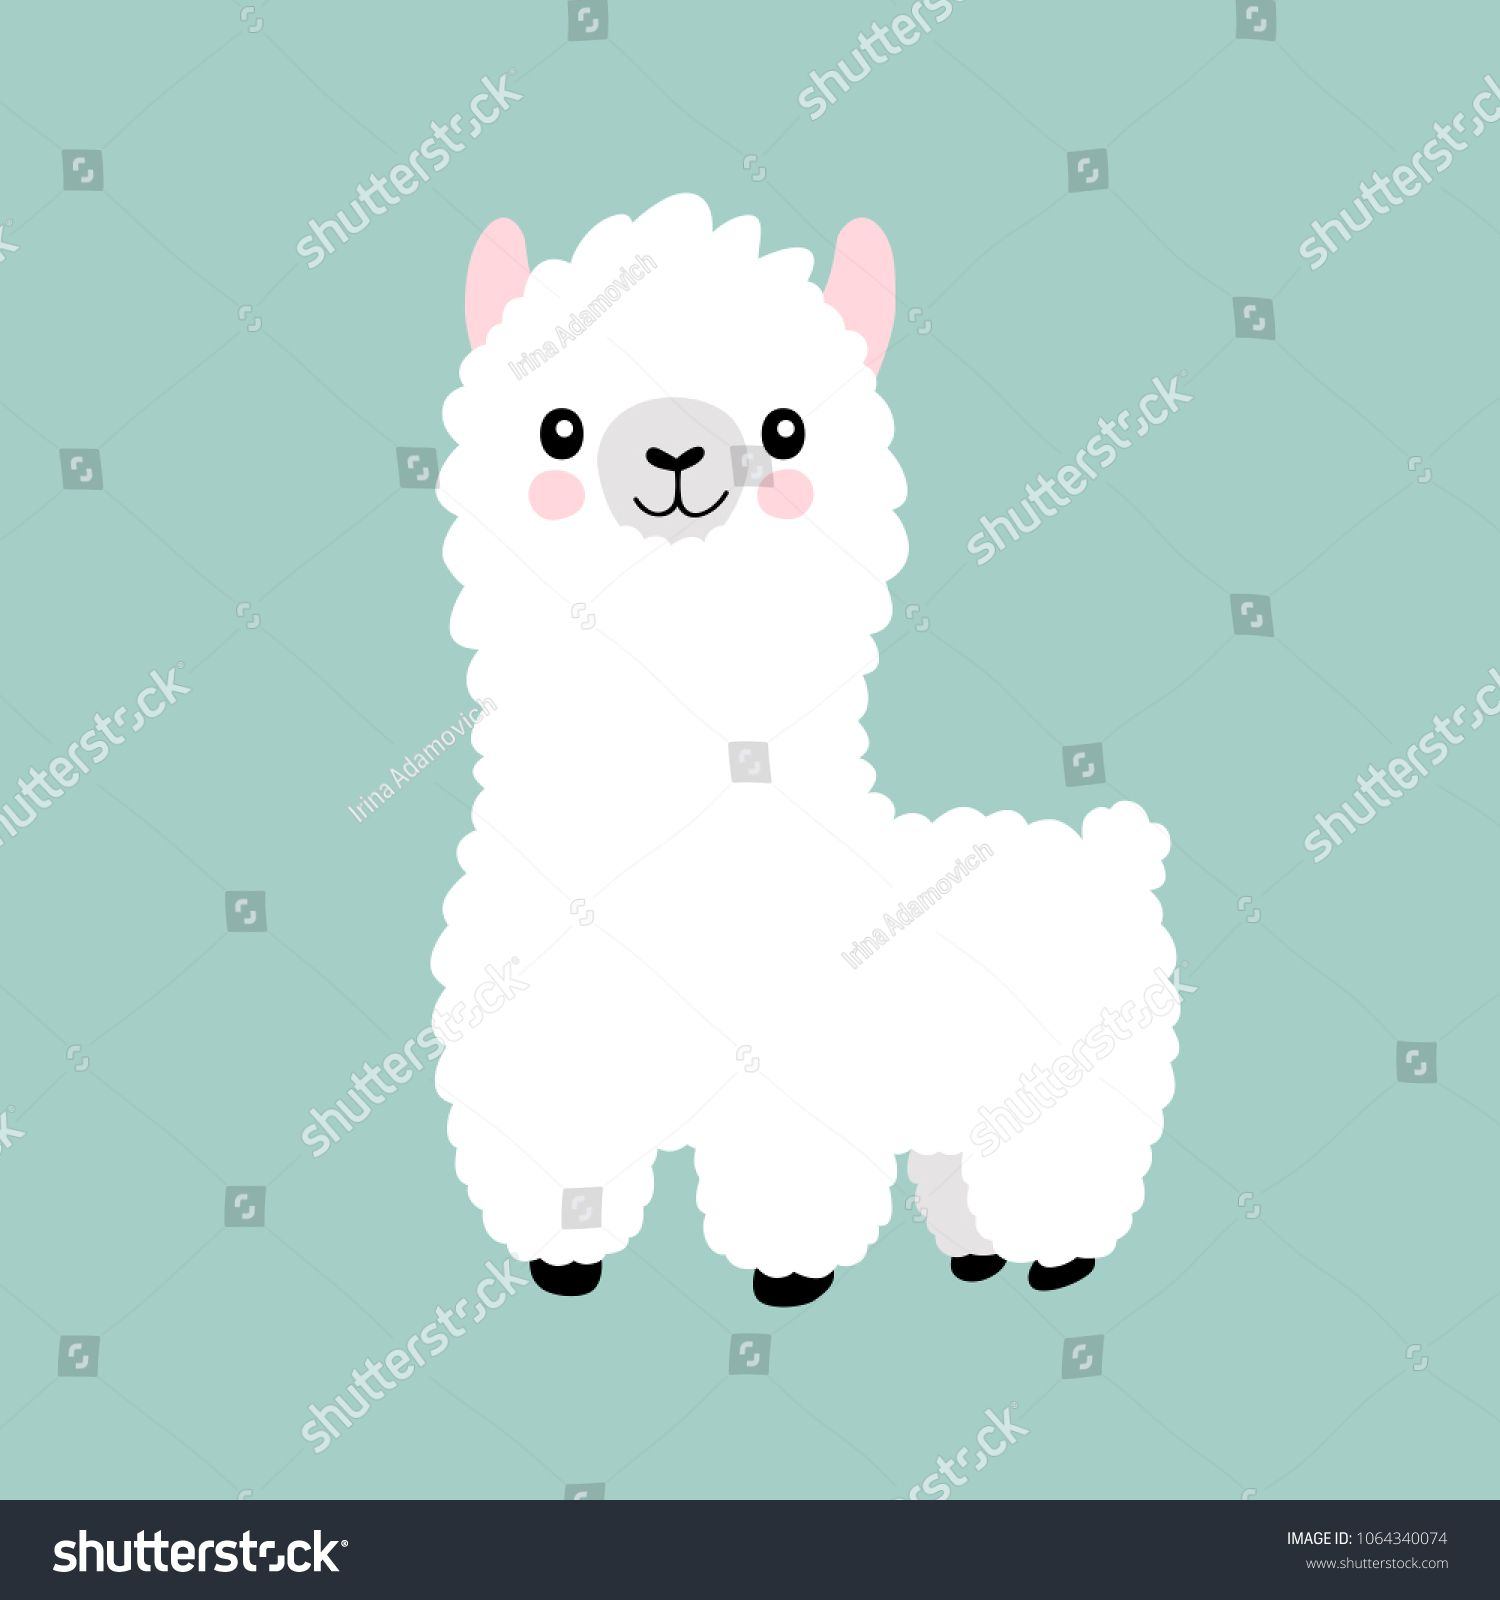 Llama Cartoon Alpaca Lama Animal Vector Isolated Illustration